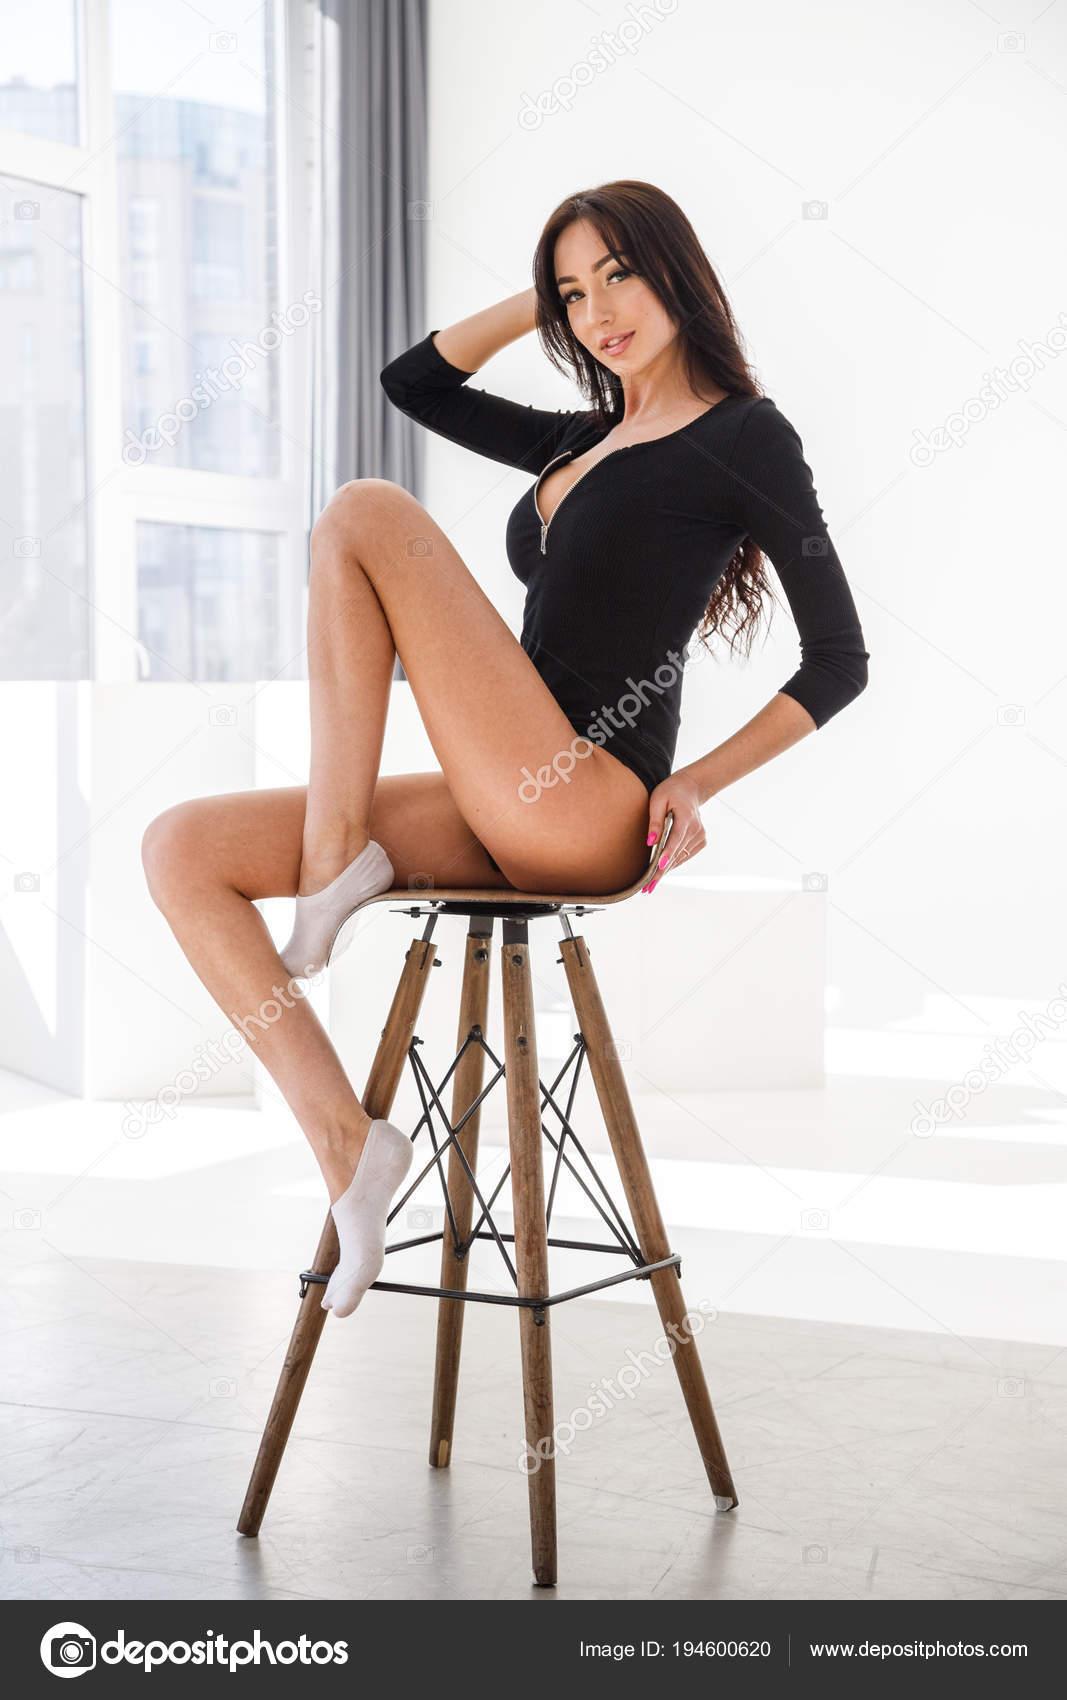 87d6278c4fc Studio Portrait Young Brunette Girl Wearing Sexy Black Lingerie Sitting —  Stock Photo